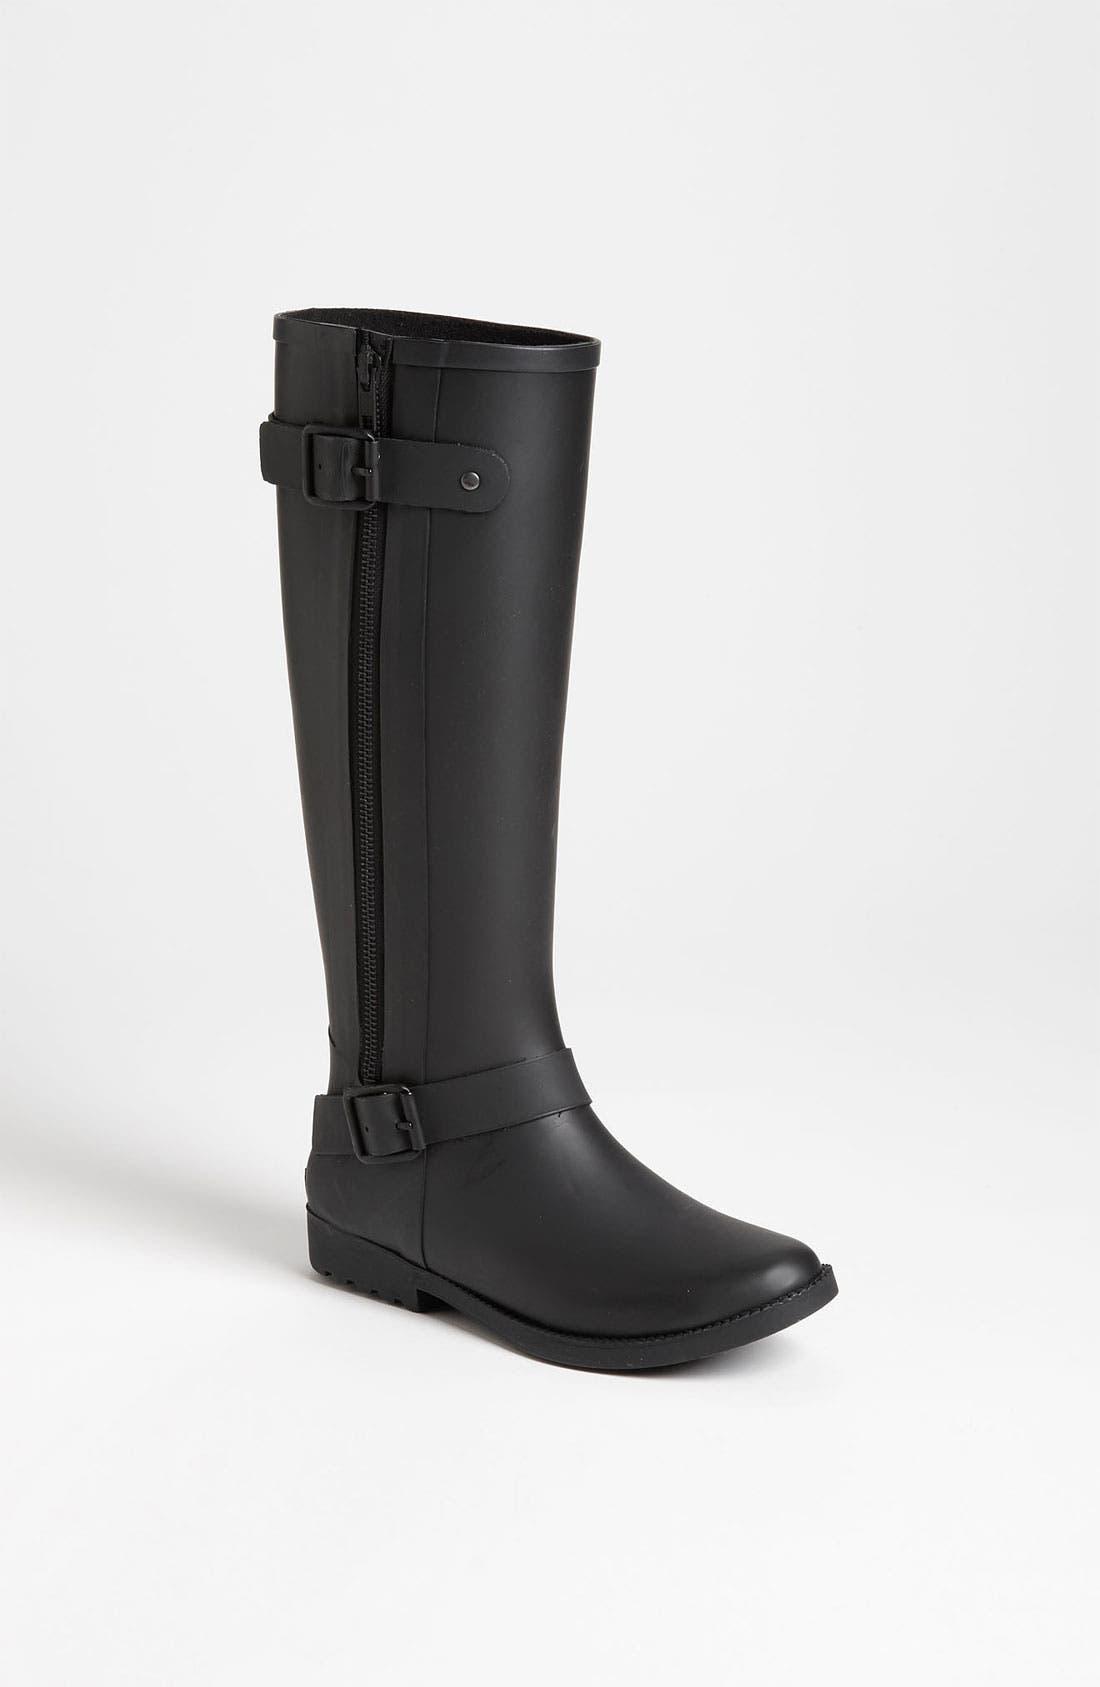 Alternate Image 1 Selected - ALDO 'Maudie' Rain Boot (Women)